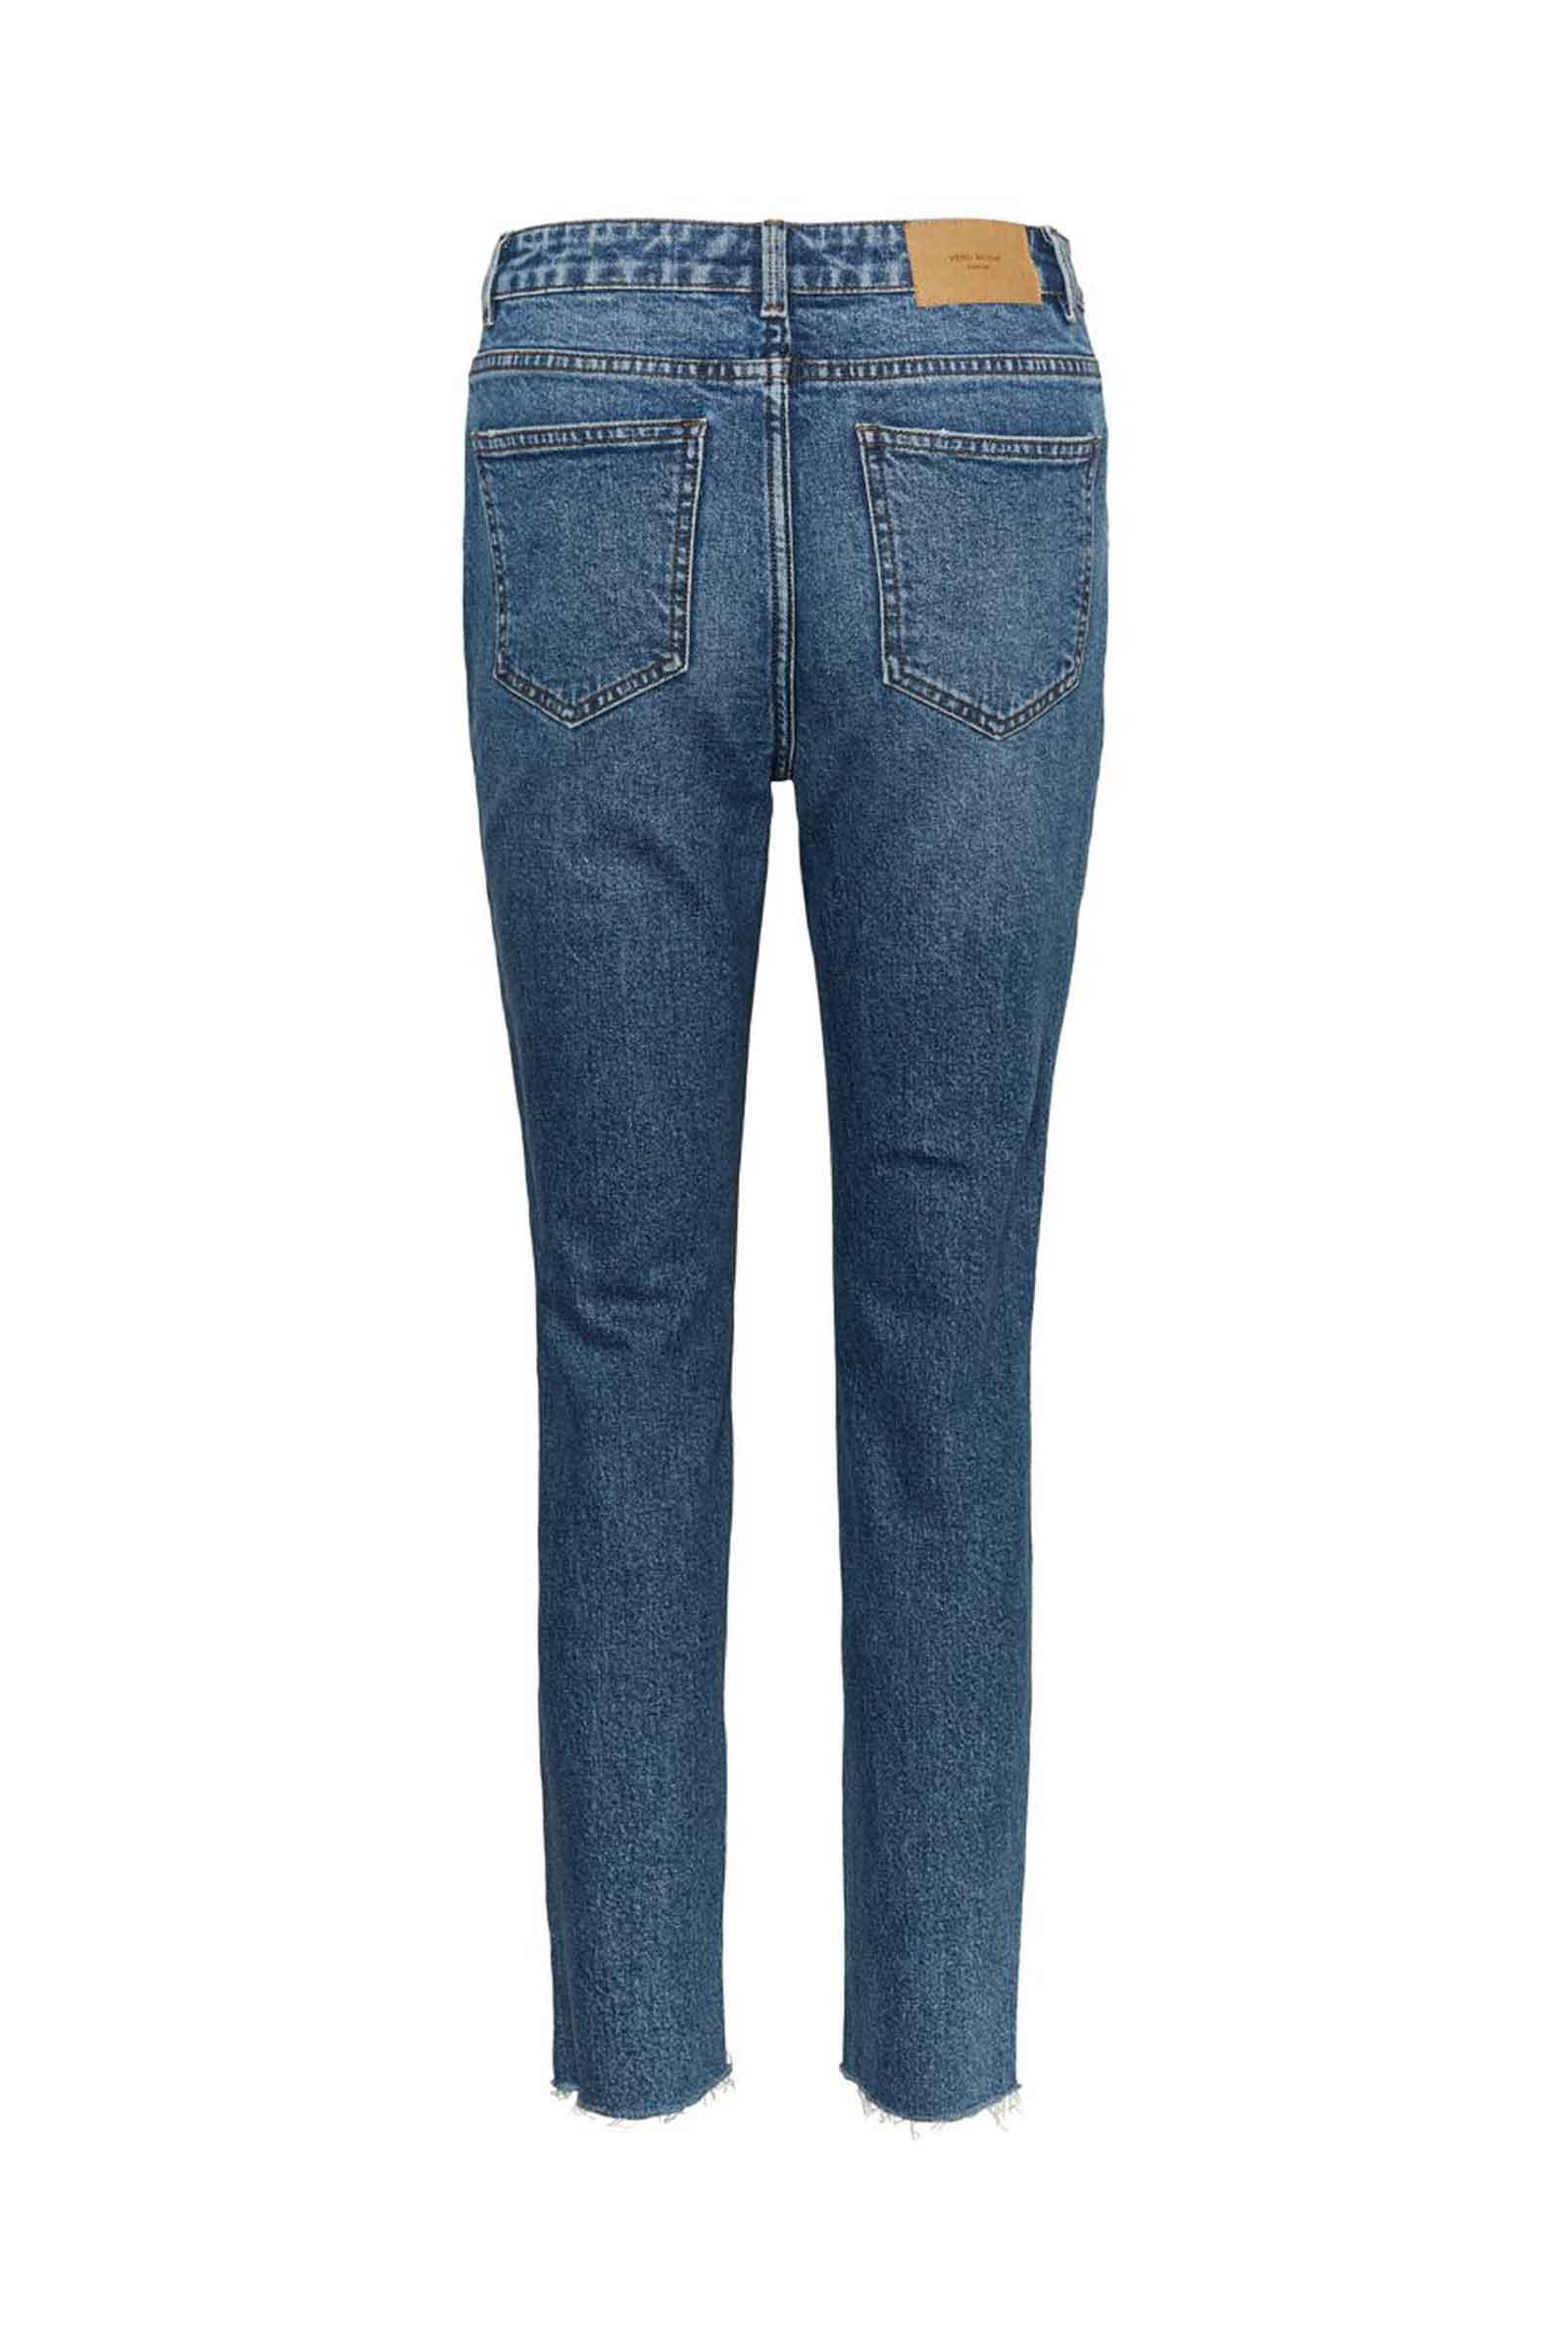 Women's Jeans VERO MODA   Jeans   10248825Medium Blue Denim